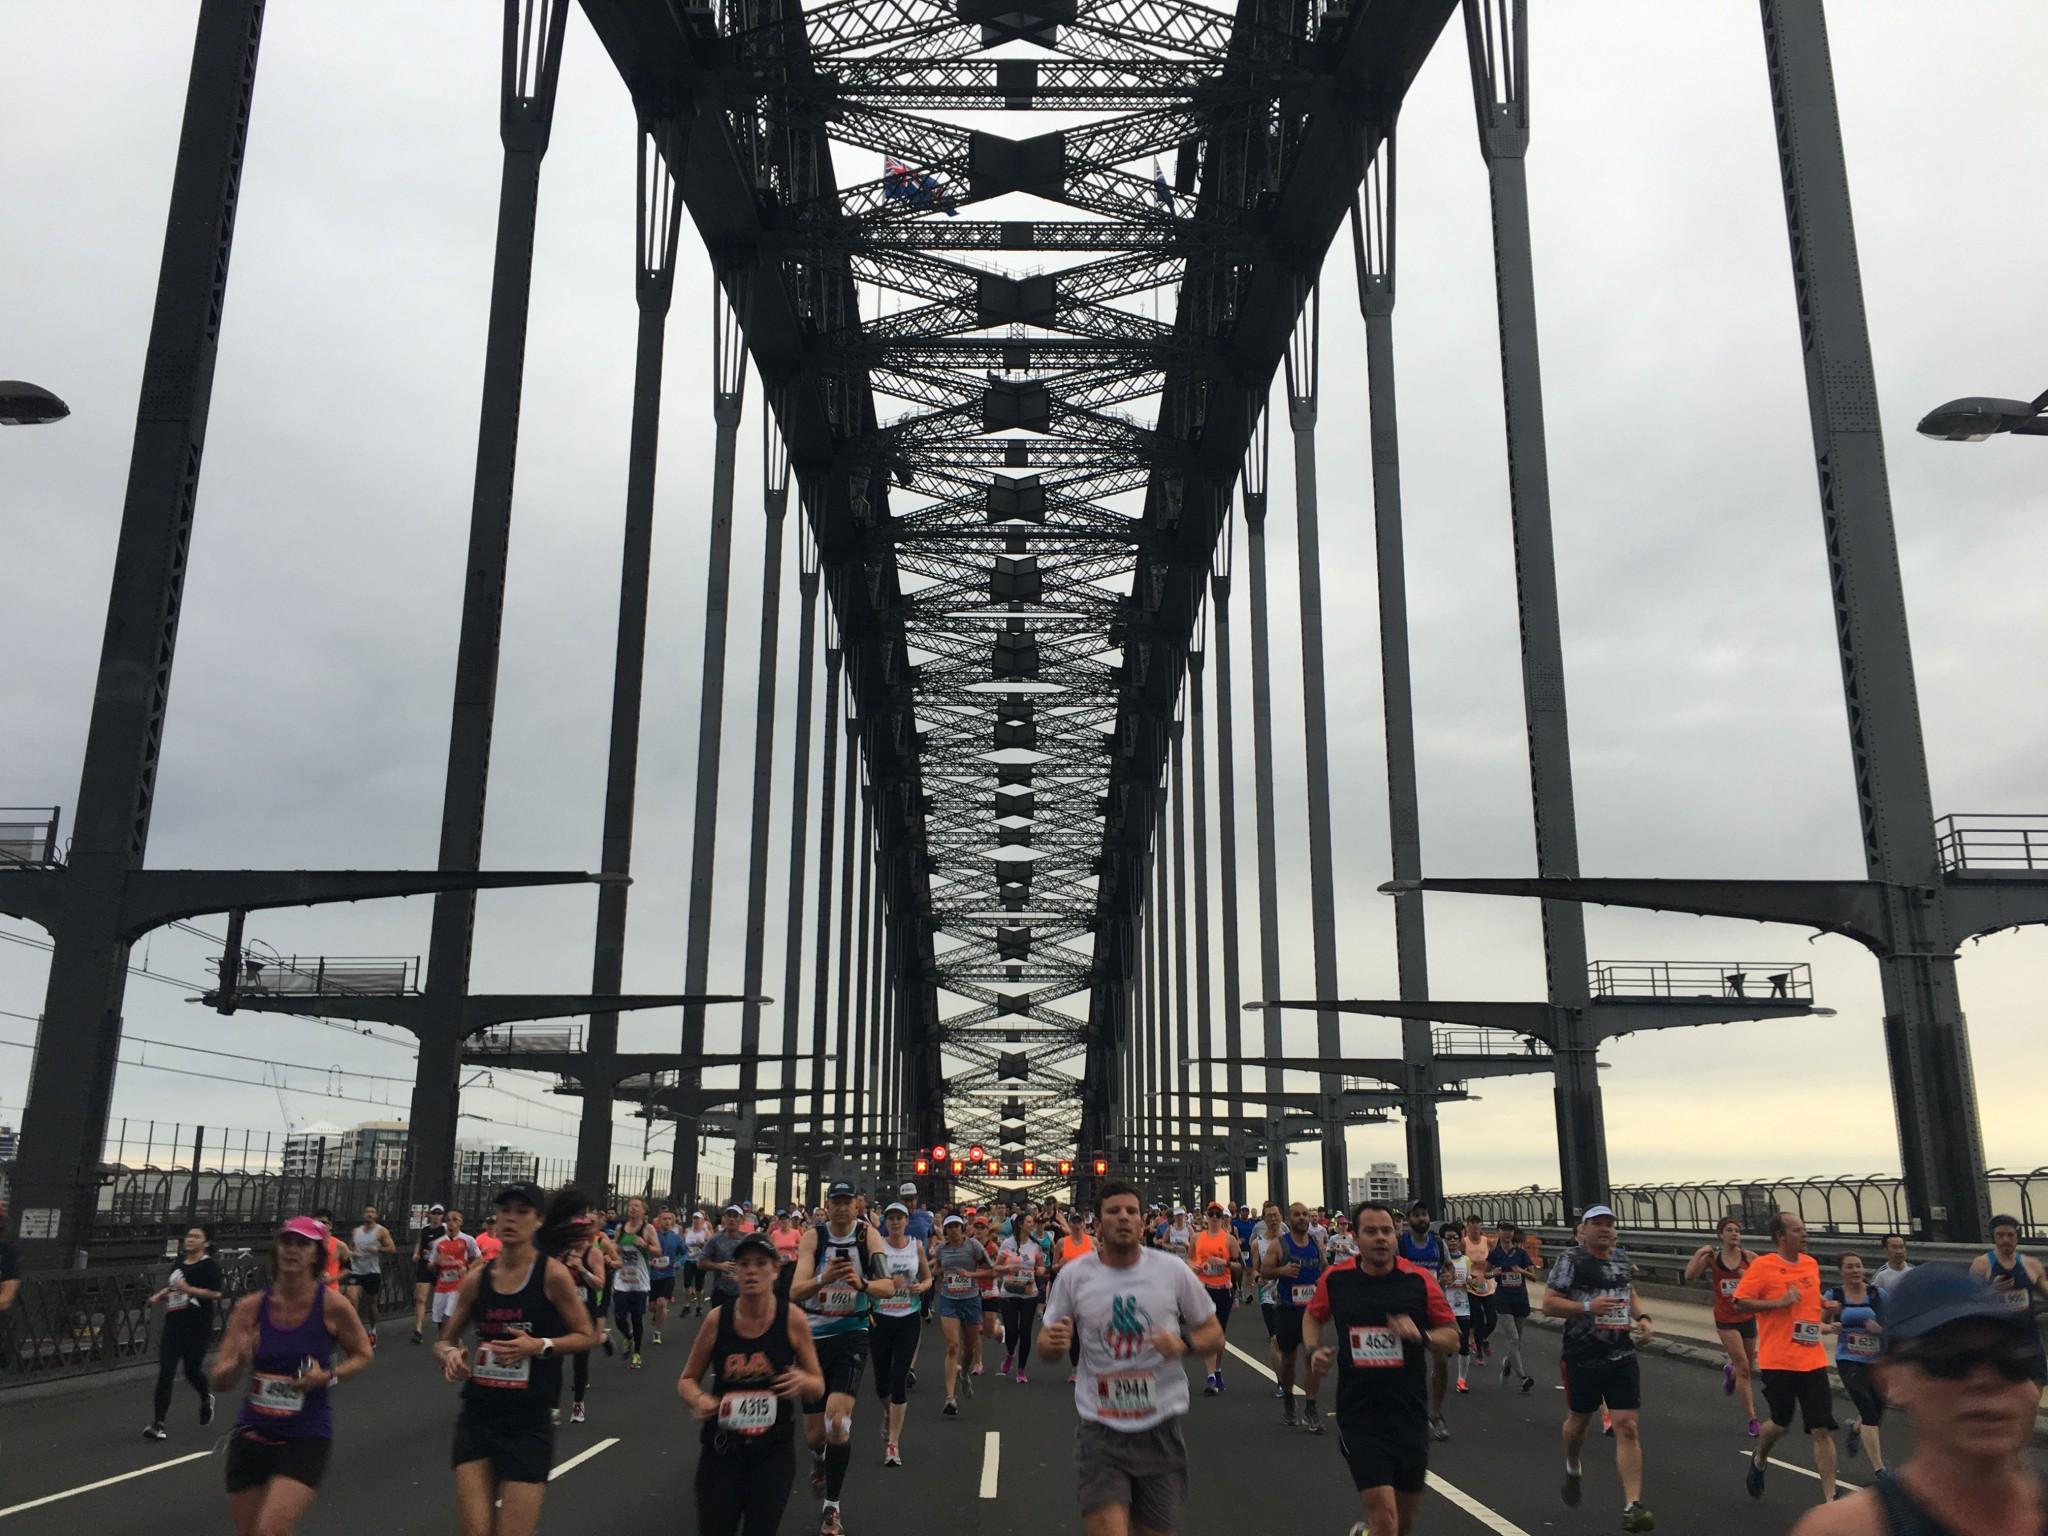 sydneymarathon1